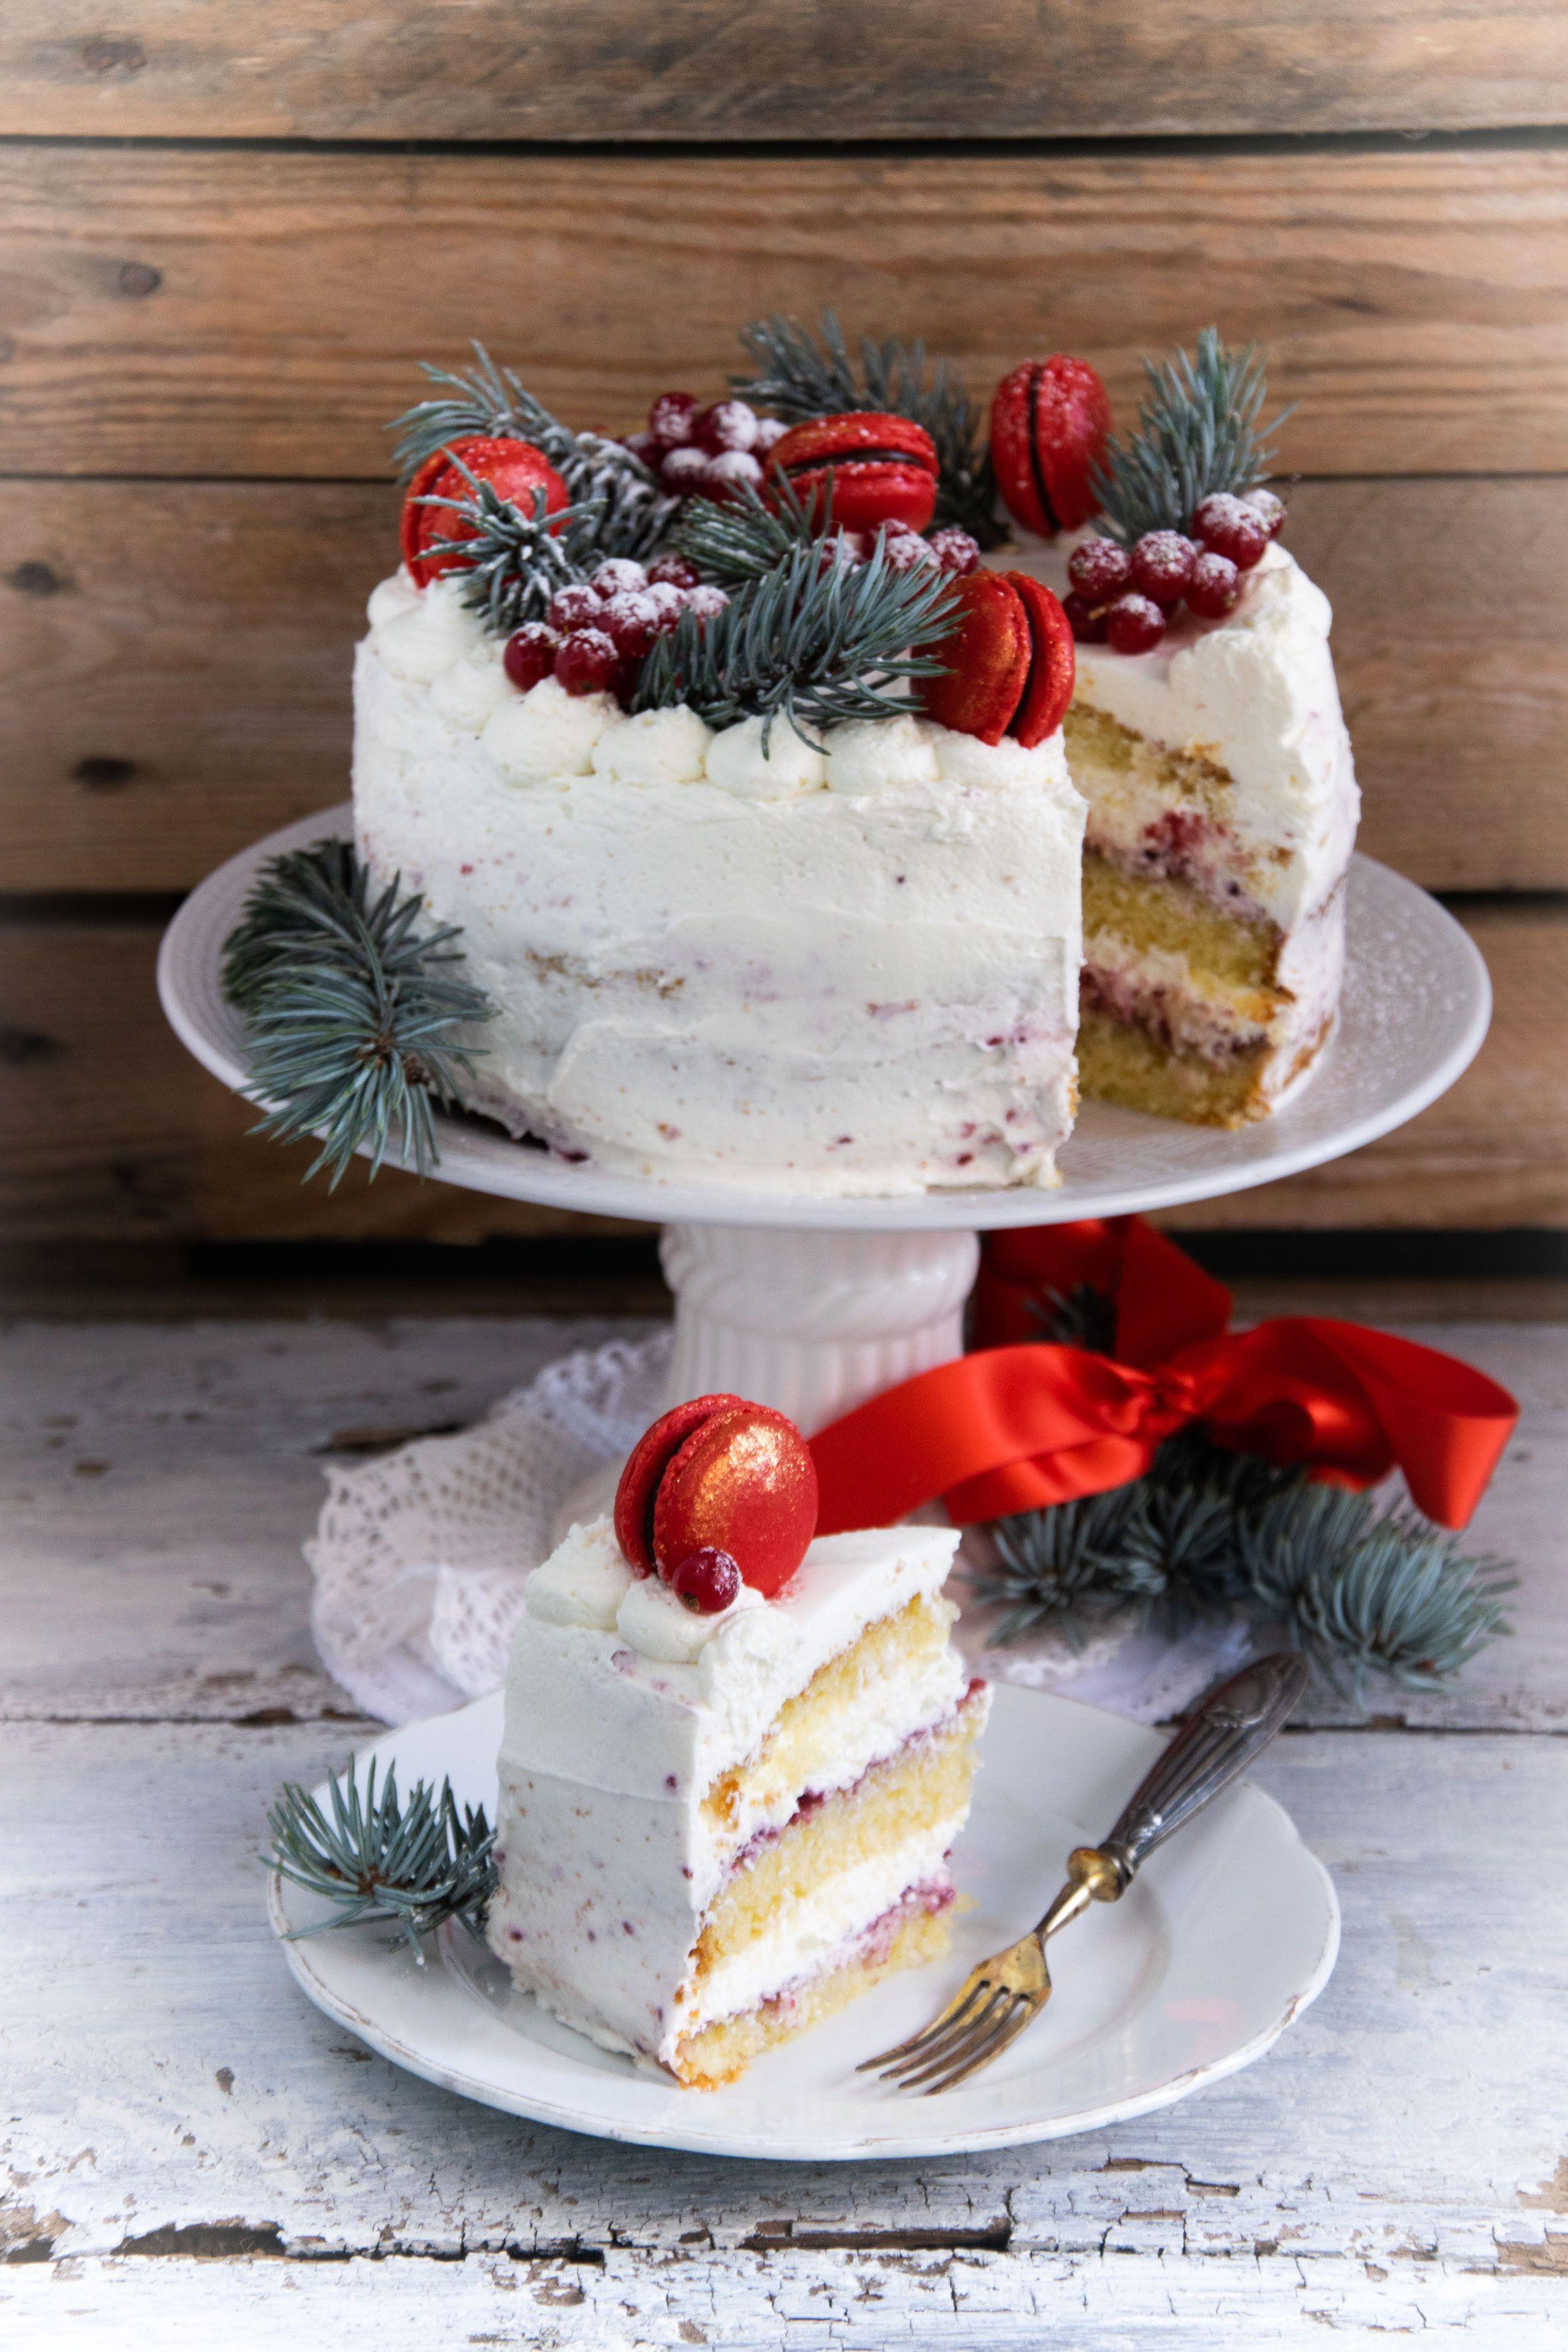 Torte Decorate Per Natale torta di natalee tanti auguri ❤️ - ilgattoghiotto.it